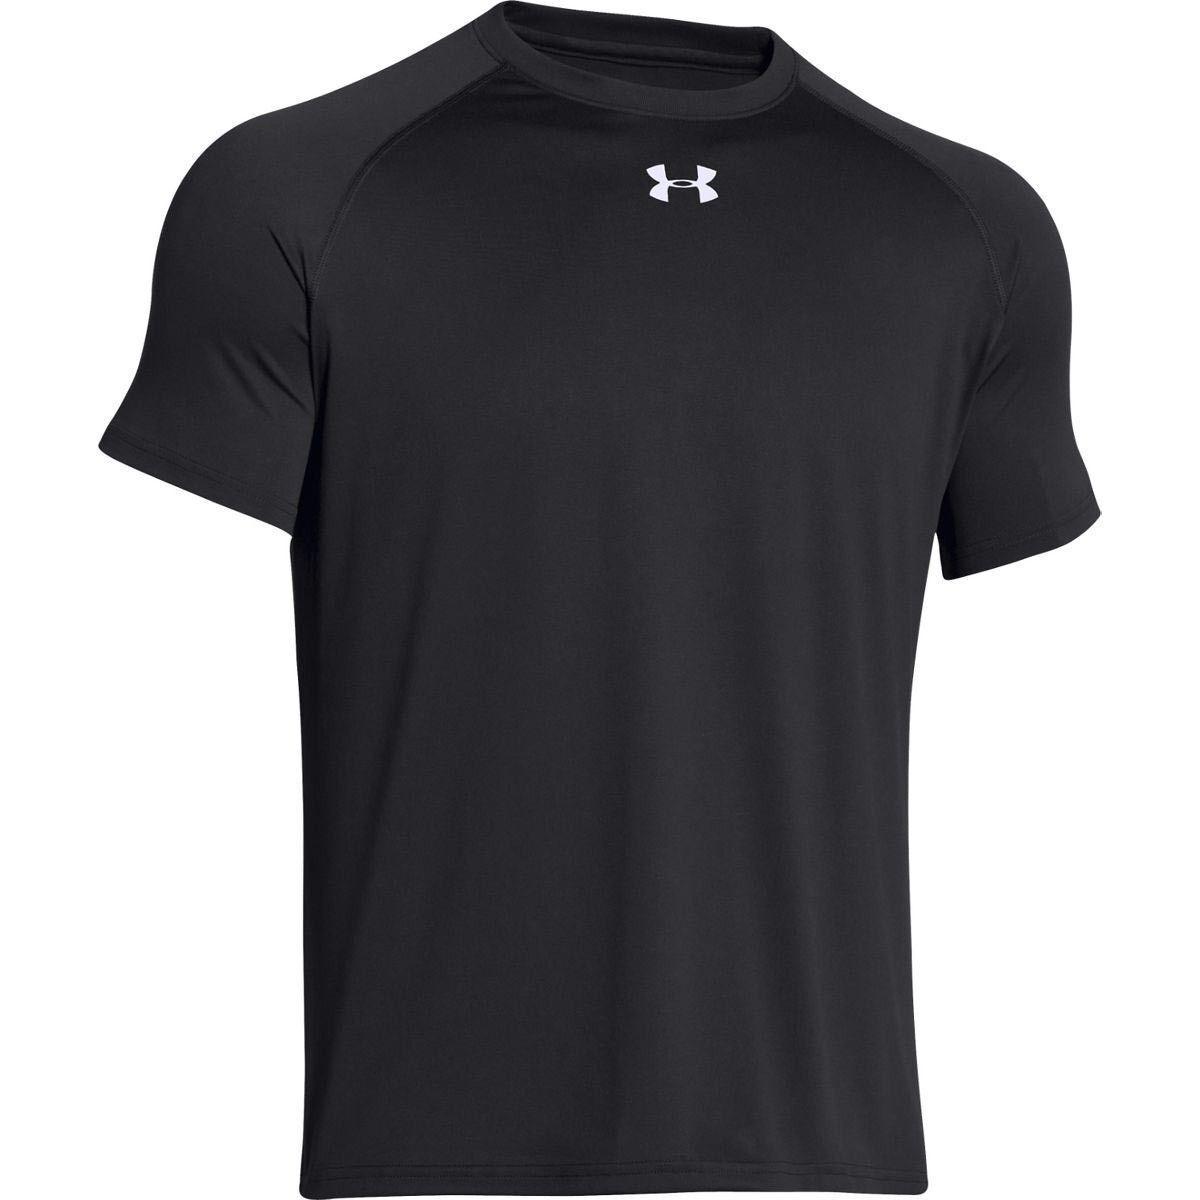 Under Armour Locker T-Shirt Black L